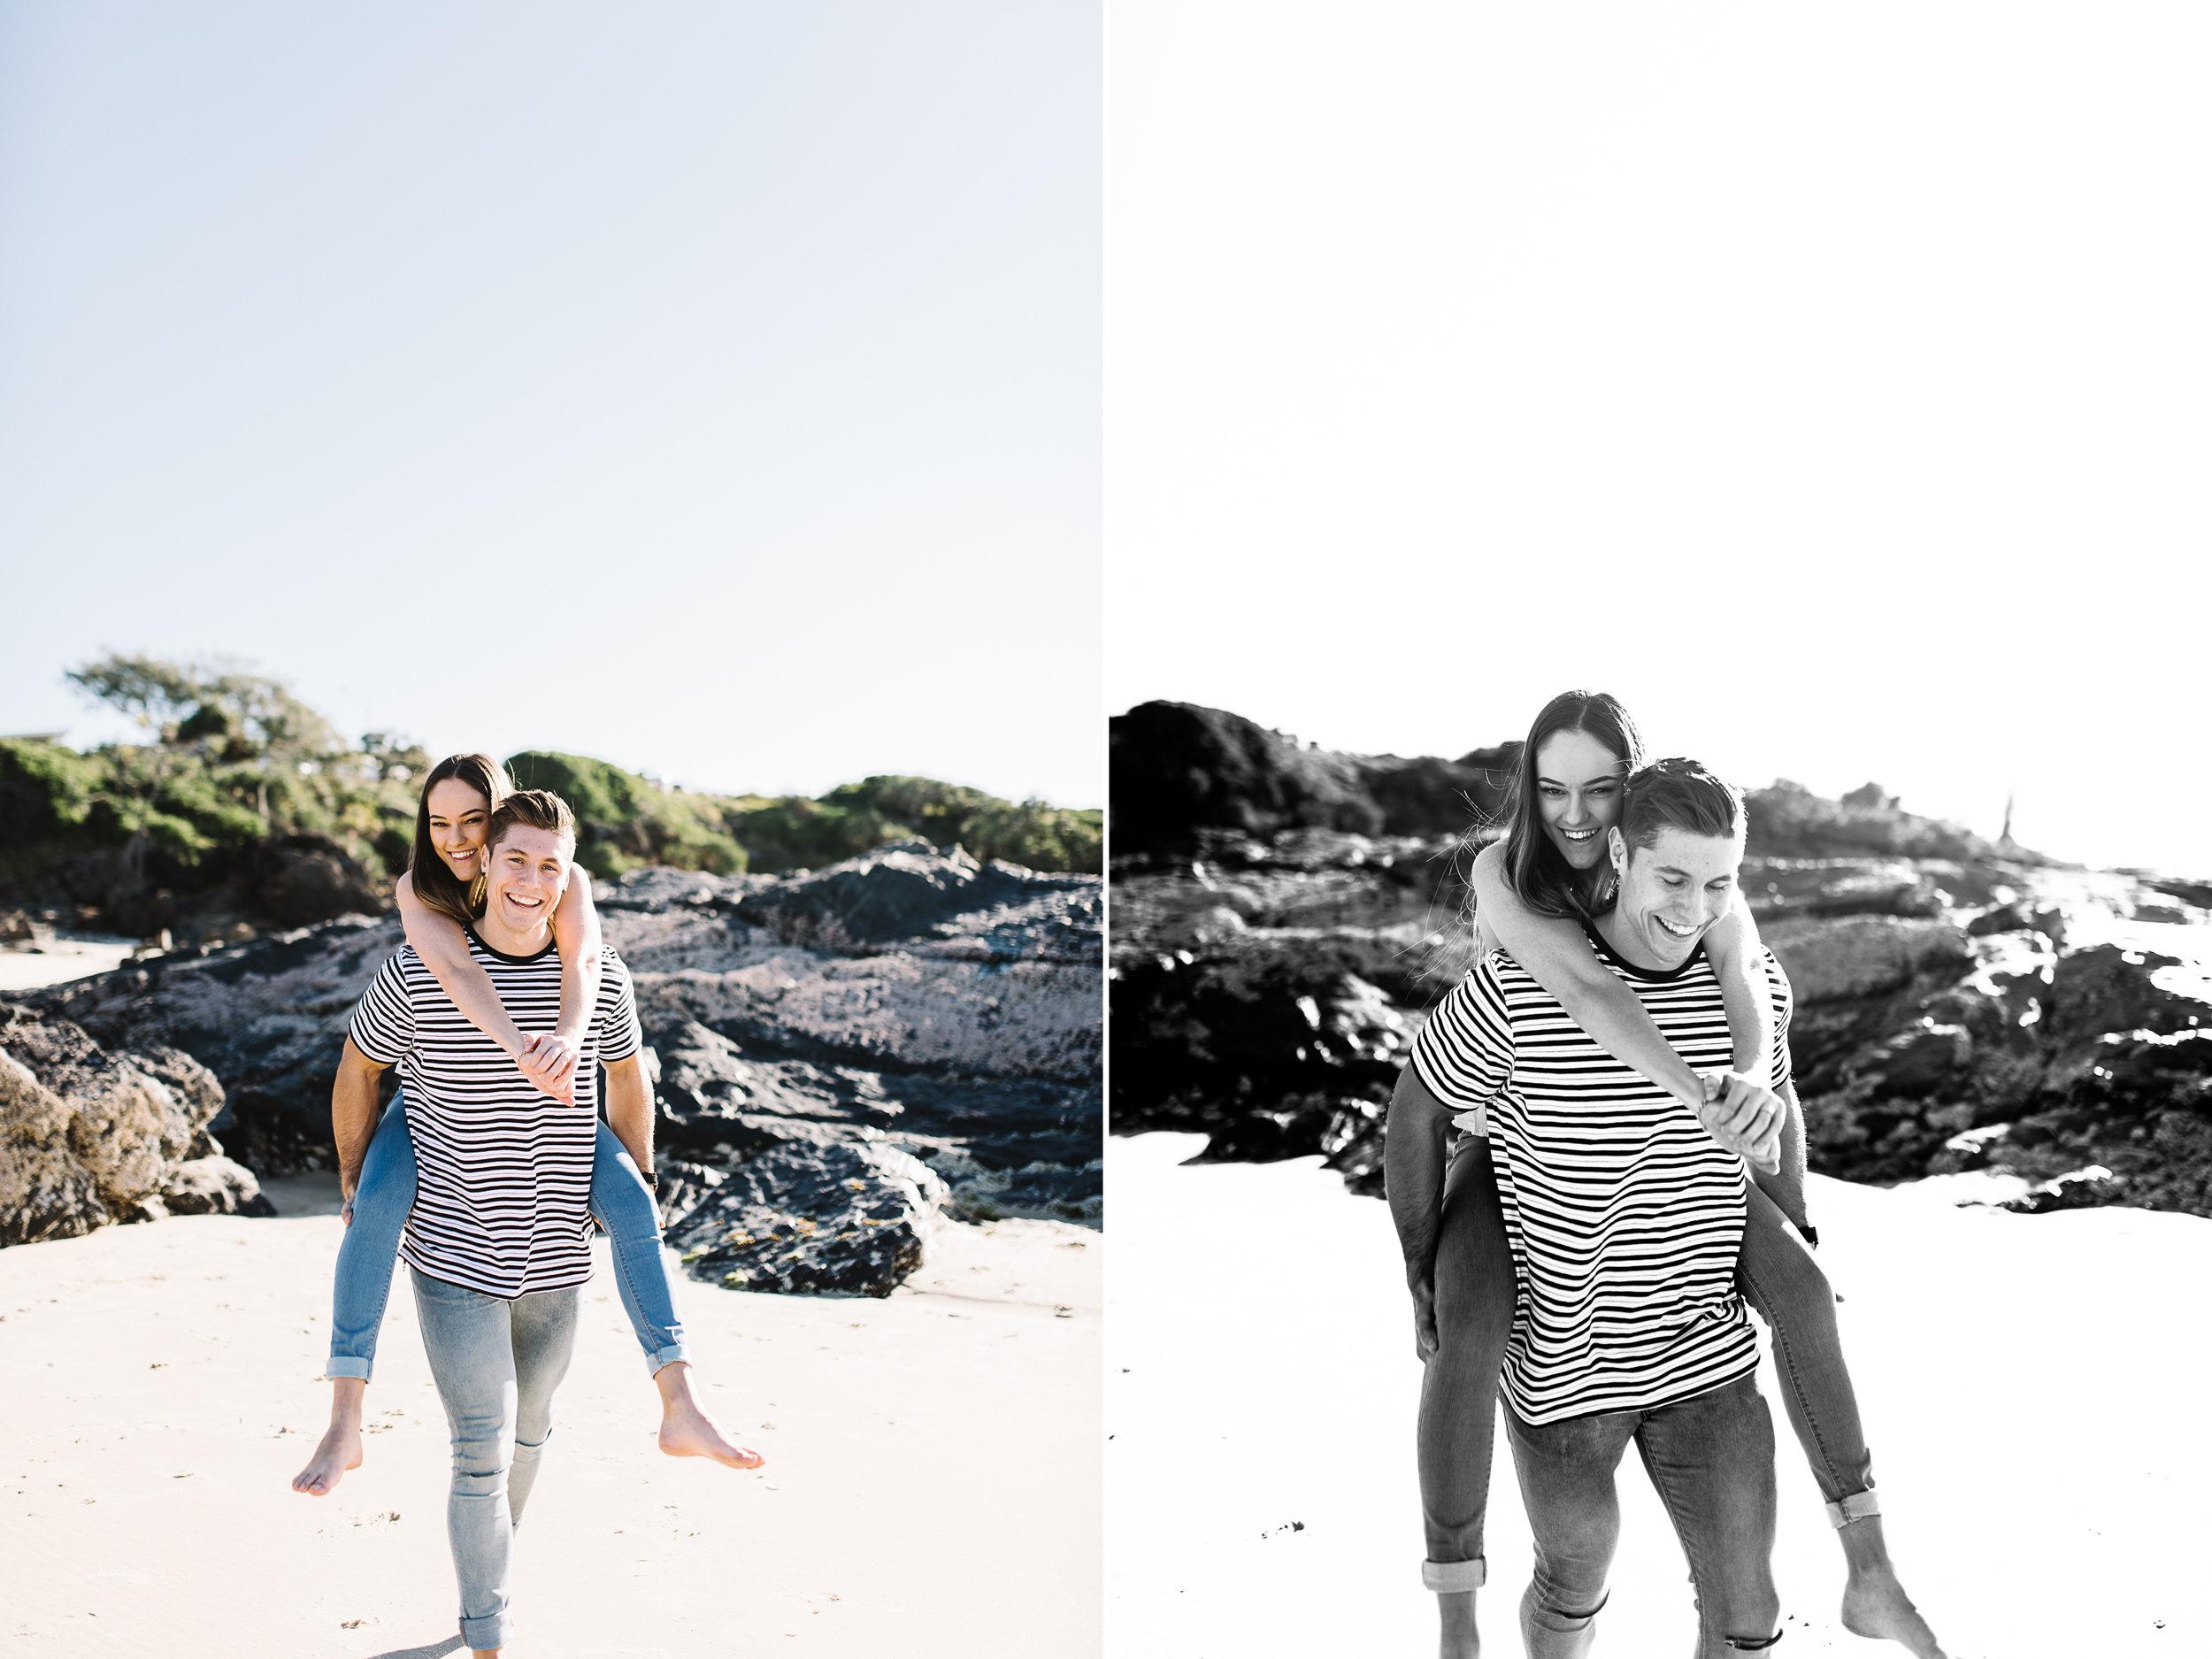 beach-engagement-shoot-7.jpg